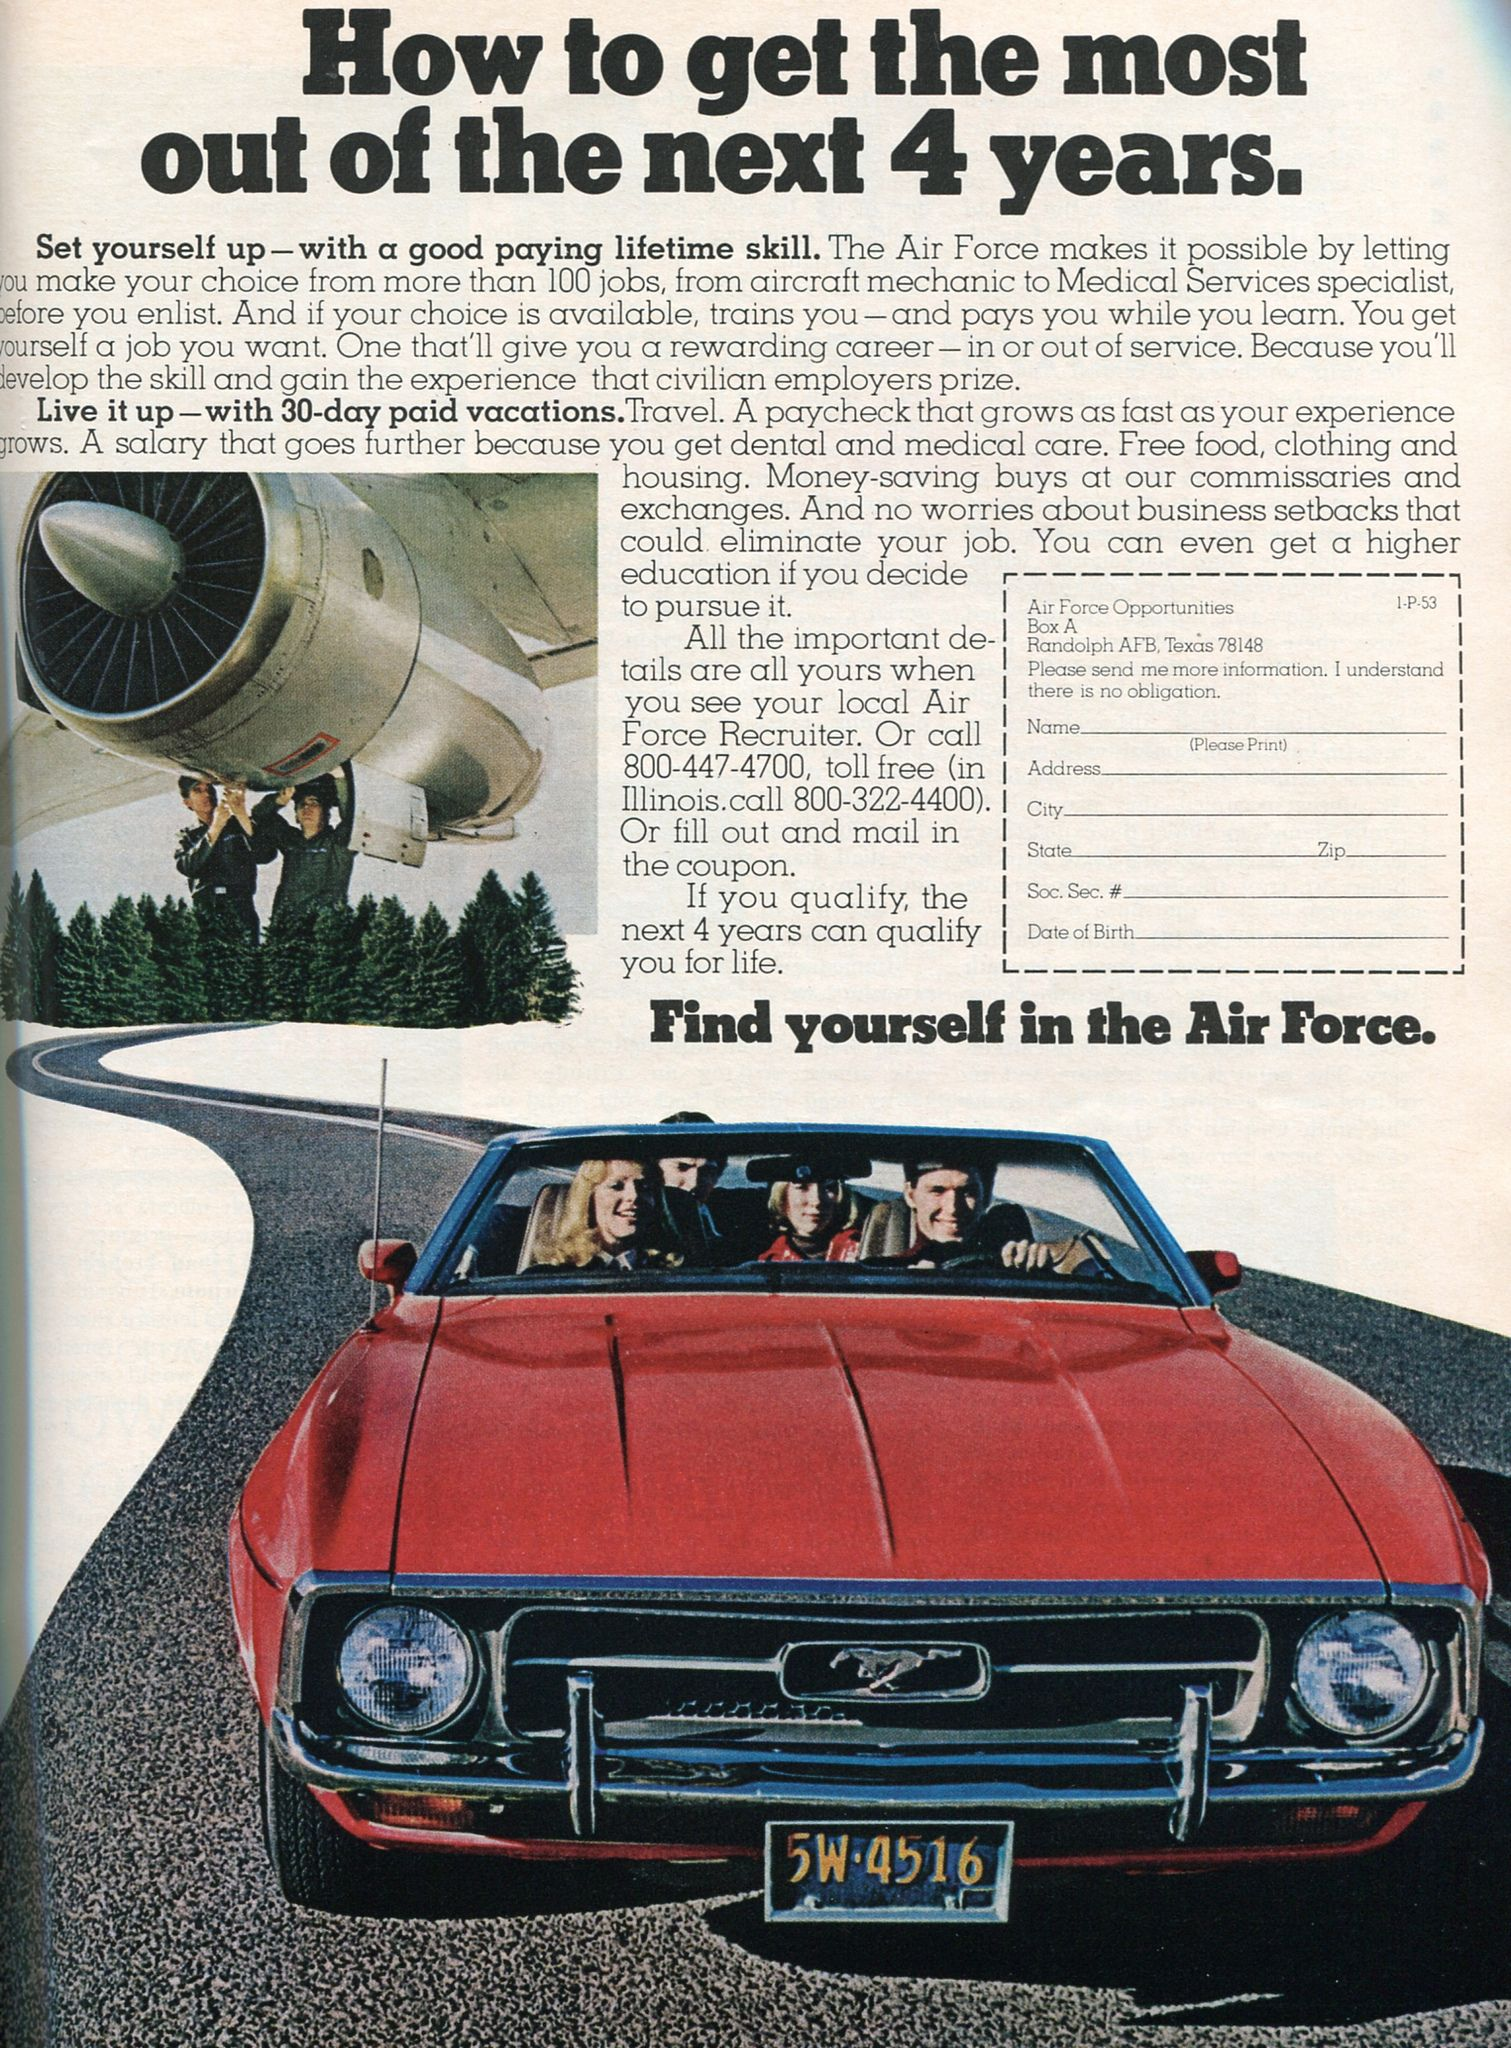 1970 Oldsmobile Cutlass Cutlass Supreme Convertible   Classy